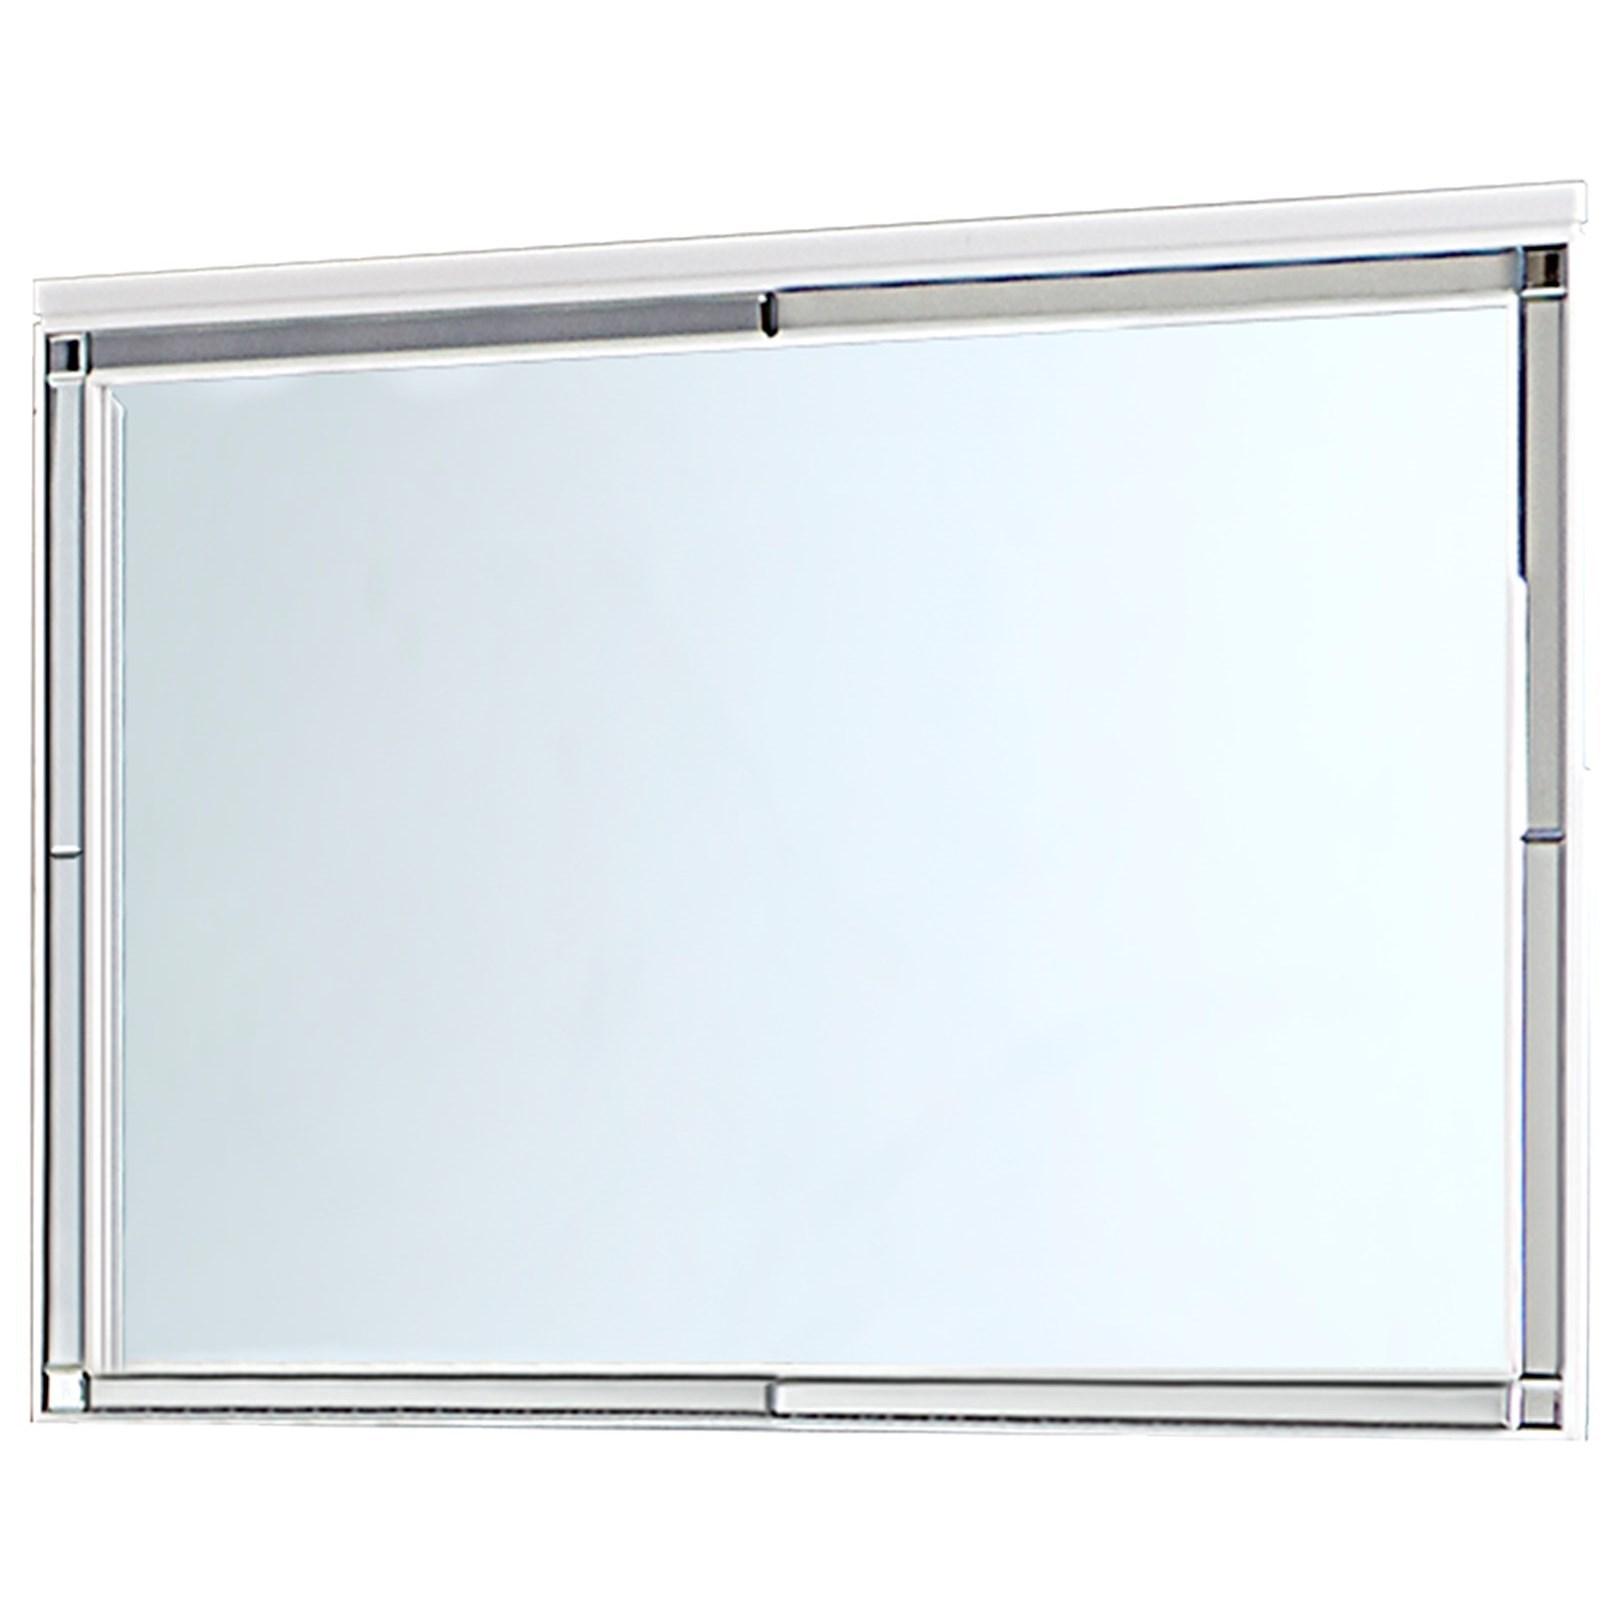 Homelegance Alonza Mirror - Item Number: 1845-6